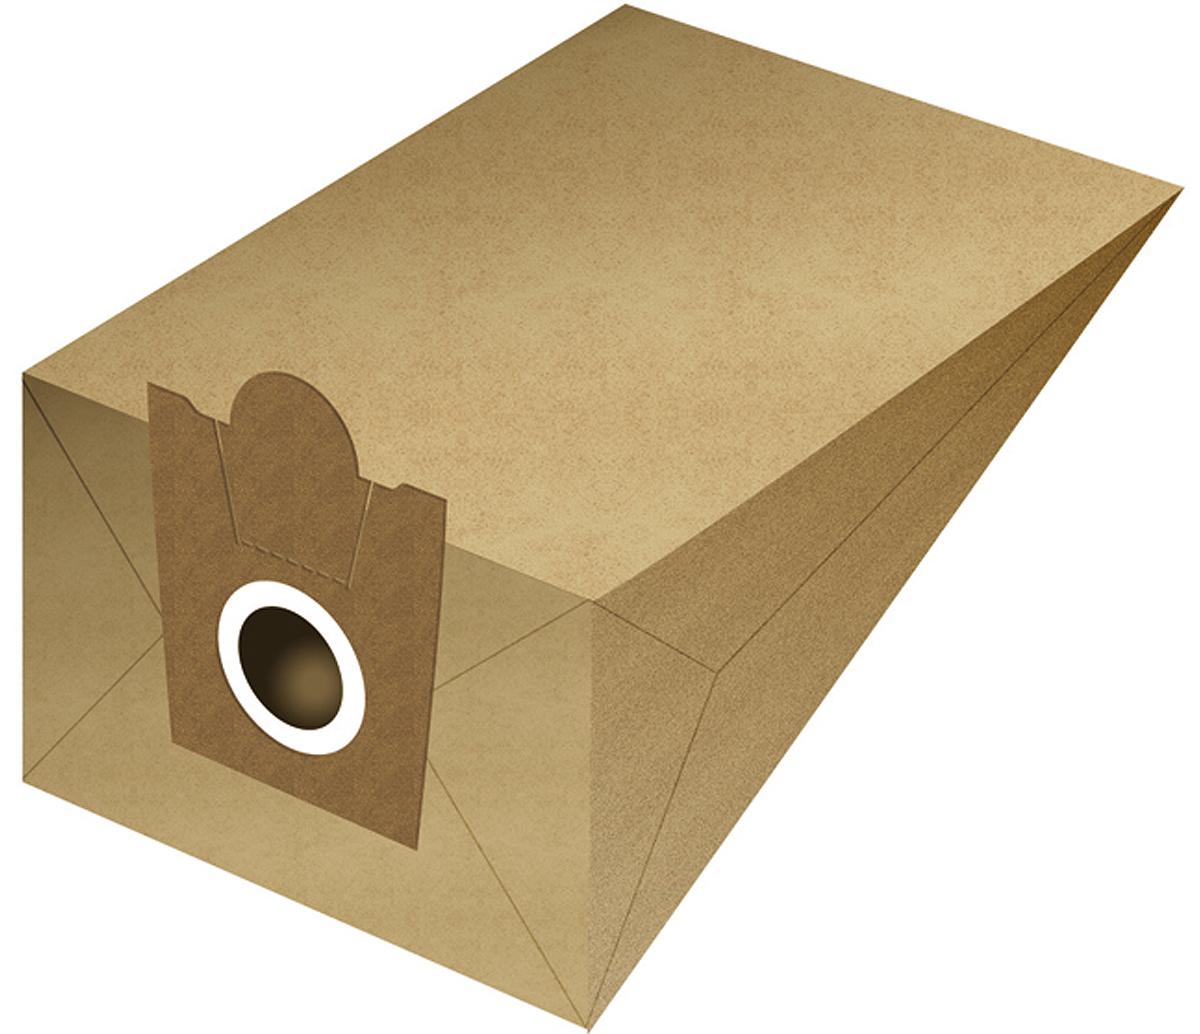 10 staubsaugerbeutel papier geeignet f r siemens super 1100 vs 5 staubsauger ebay. Black Bedroom Furniture Sets. Home Design Ideas